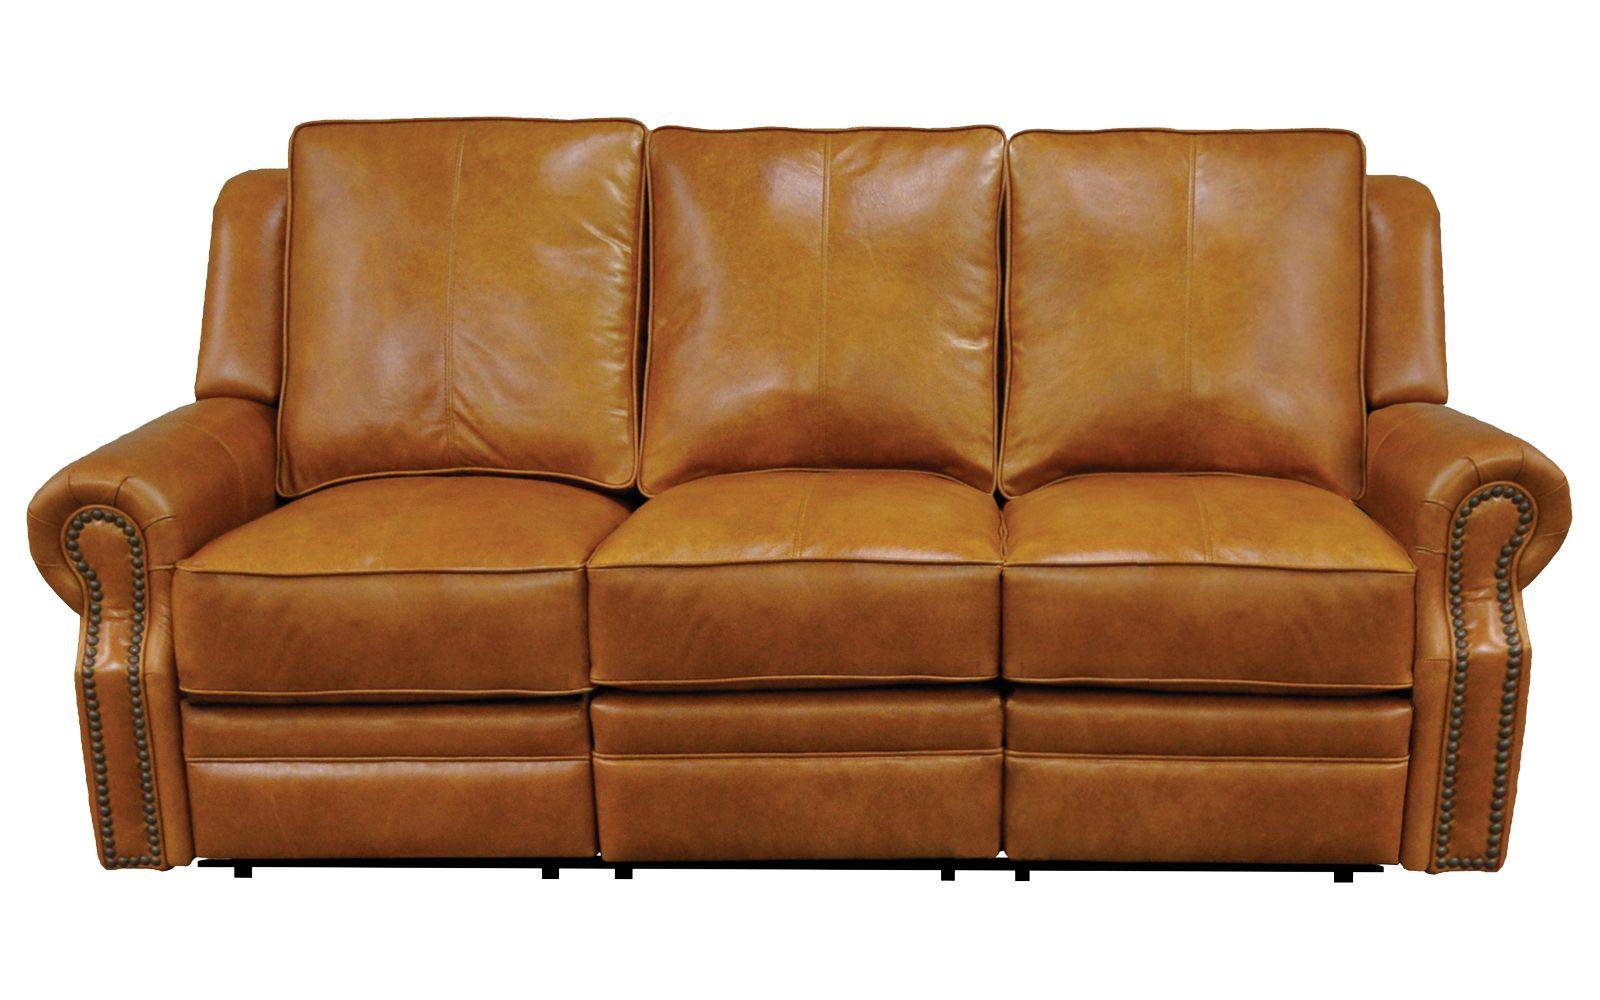 Best Leather Furniture In Texas San Antonio Austin Houston Dallas Plano Leather Furniture Reclining Sofa Sofa